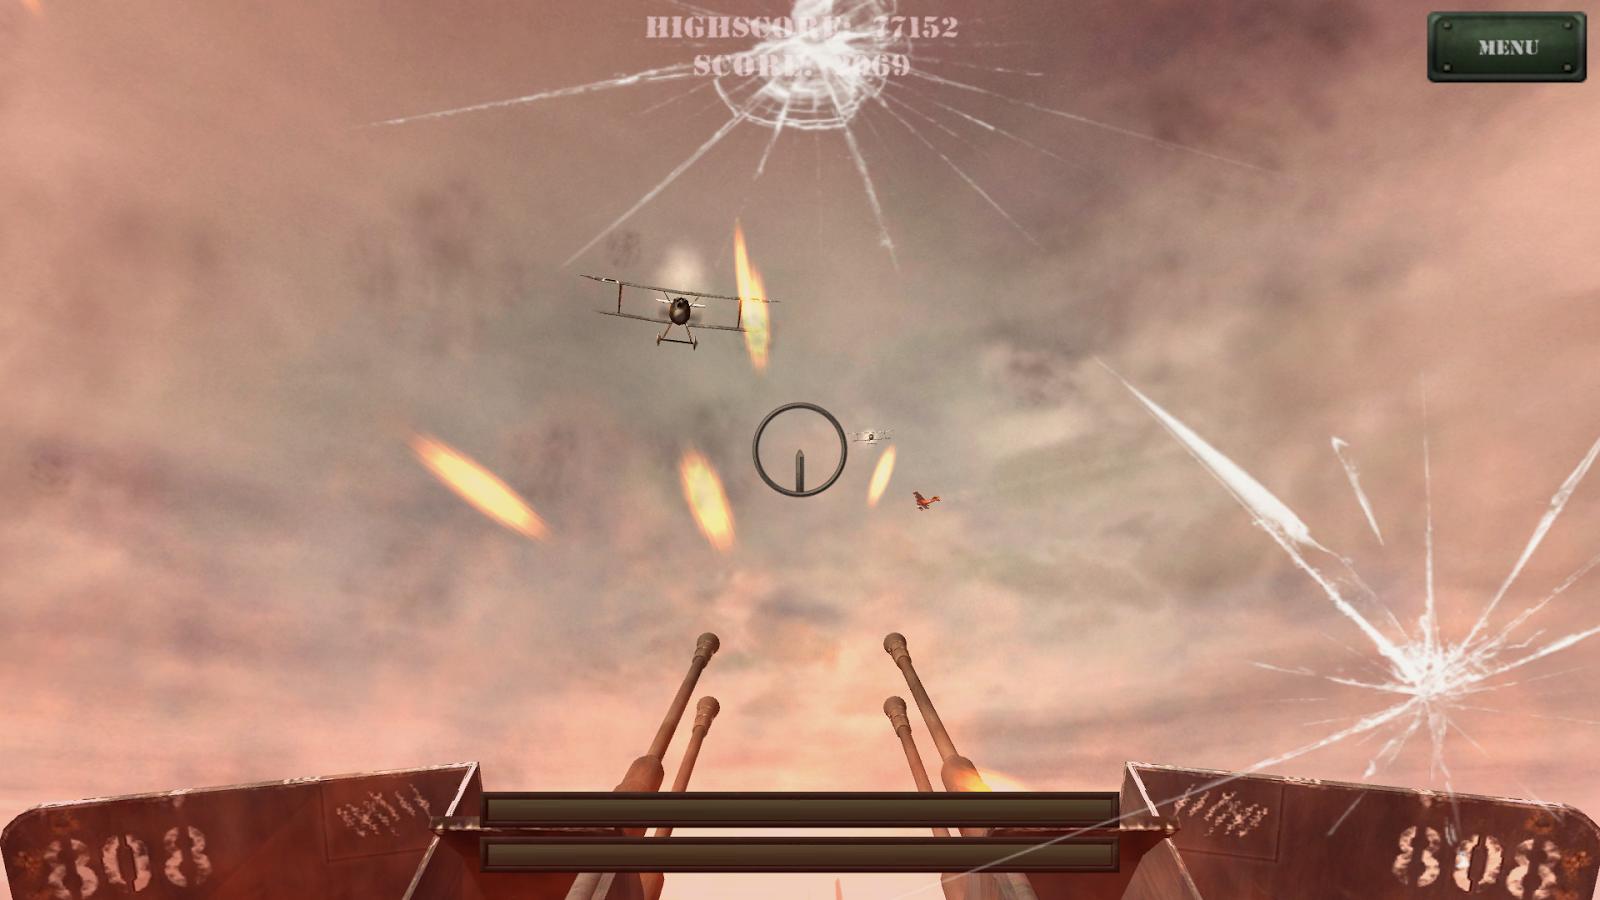 Shoot The Fokkers- screenshot